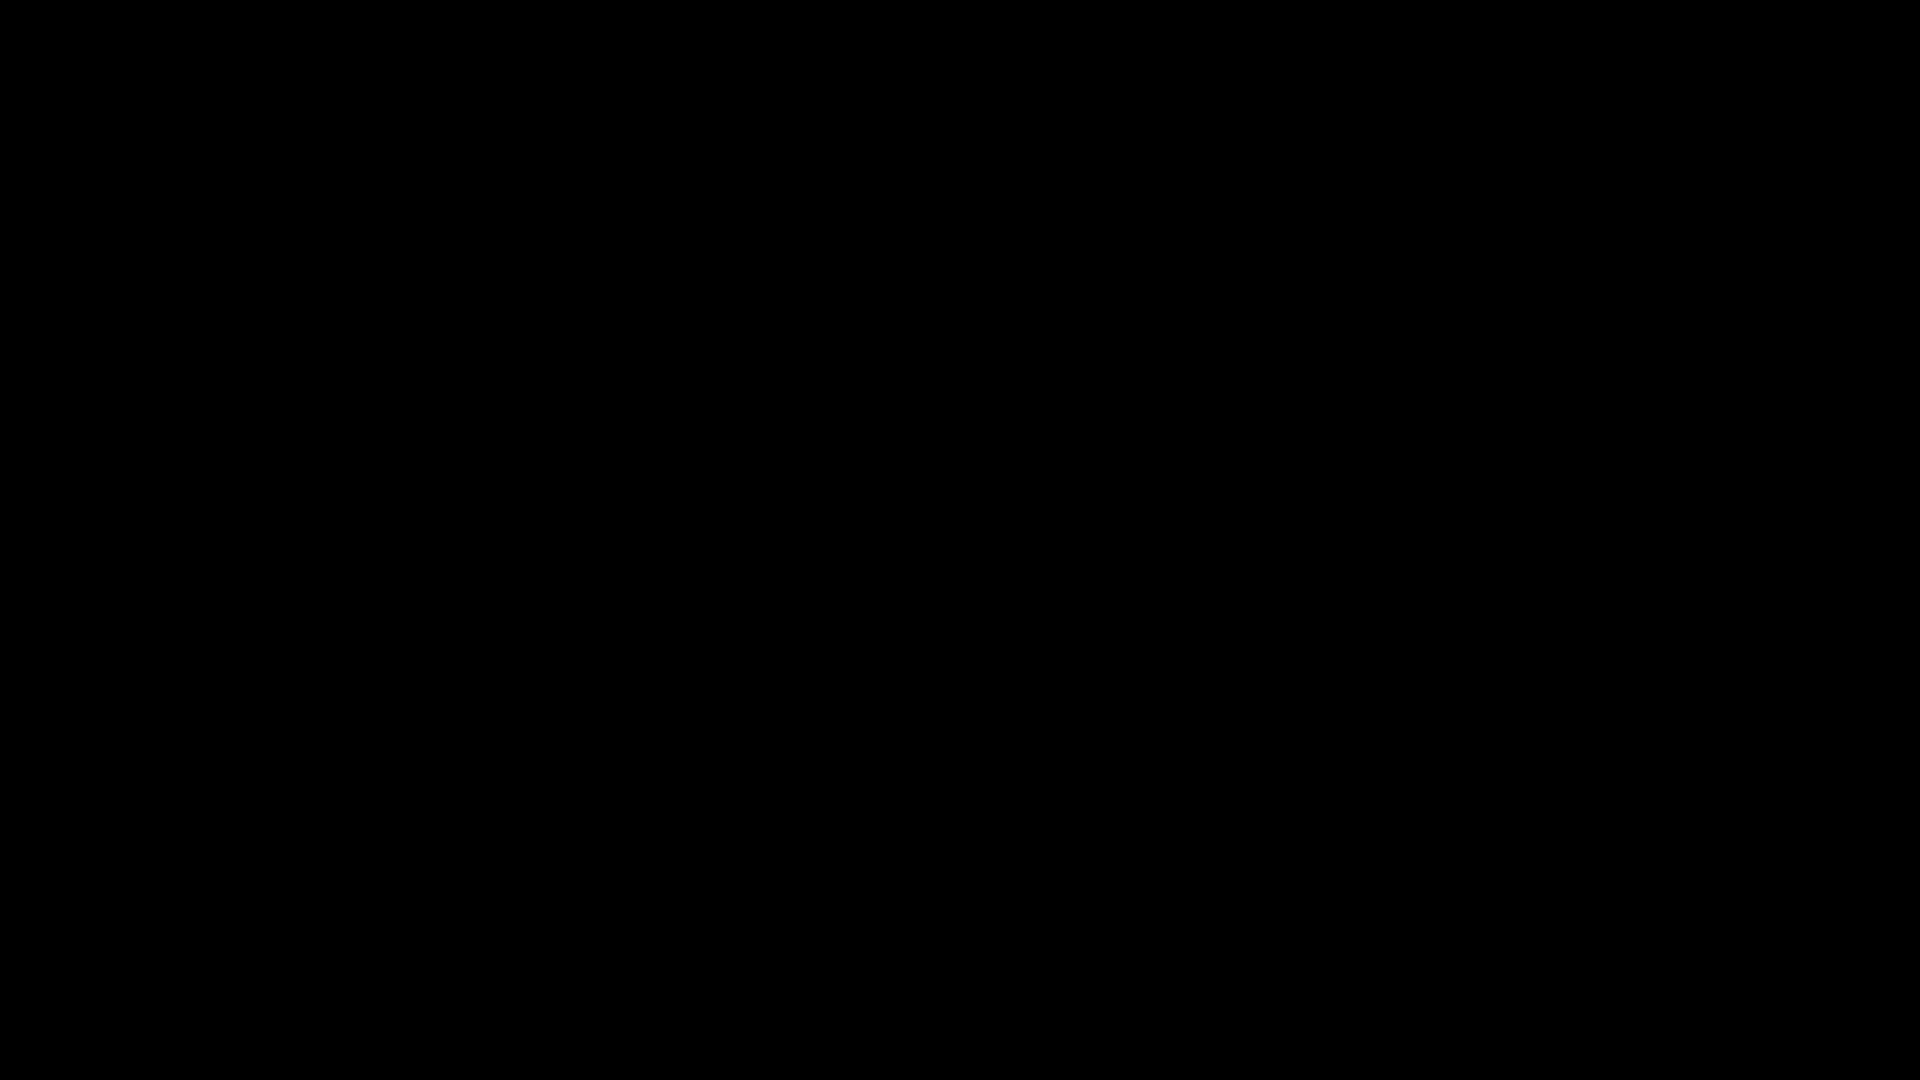 Back in the Groove, Toejam & Earl, footage, game, gameplay, games, gamespot, gamespot.com, gaming, juego, linux, mac, pc, prototype, video game, Toejam & Earl: Back in the Groove - Gameplay Trailer GIFs